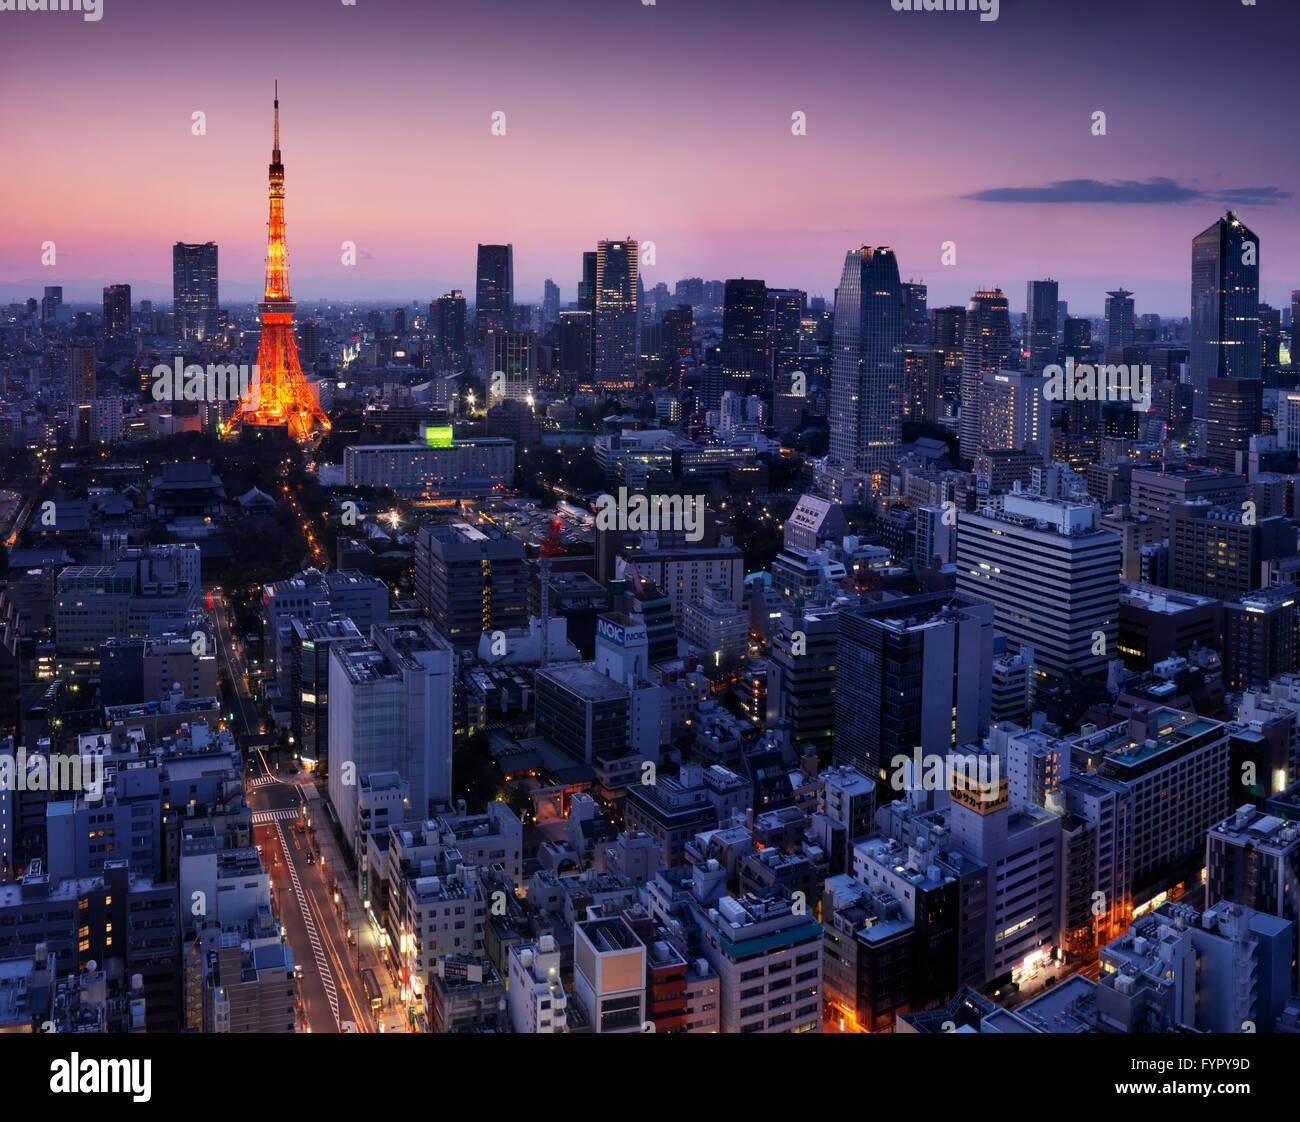 Paisaje urbano de antena con la Torre de Tokyo iluminada en penumbra, Minato, Tokio, Japón Foto de stock